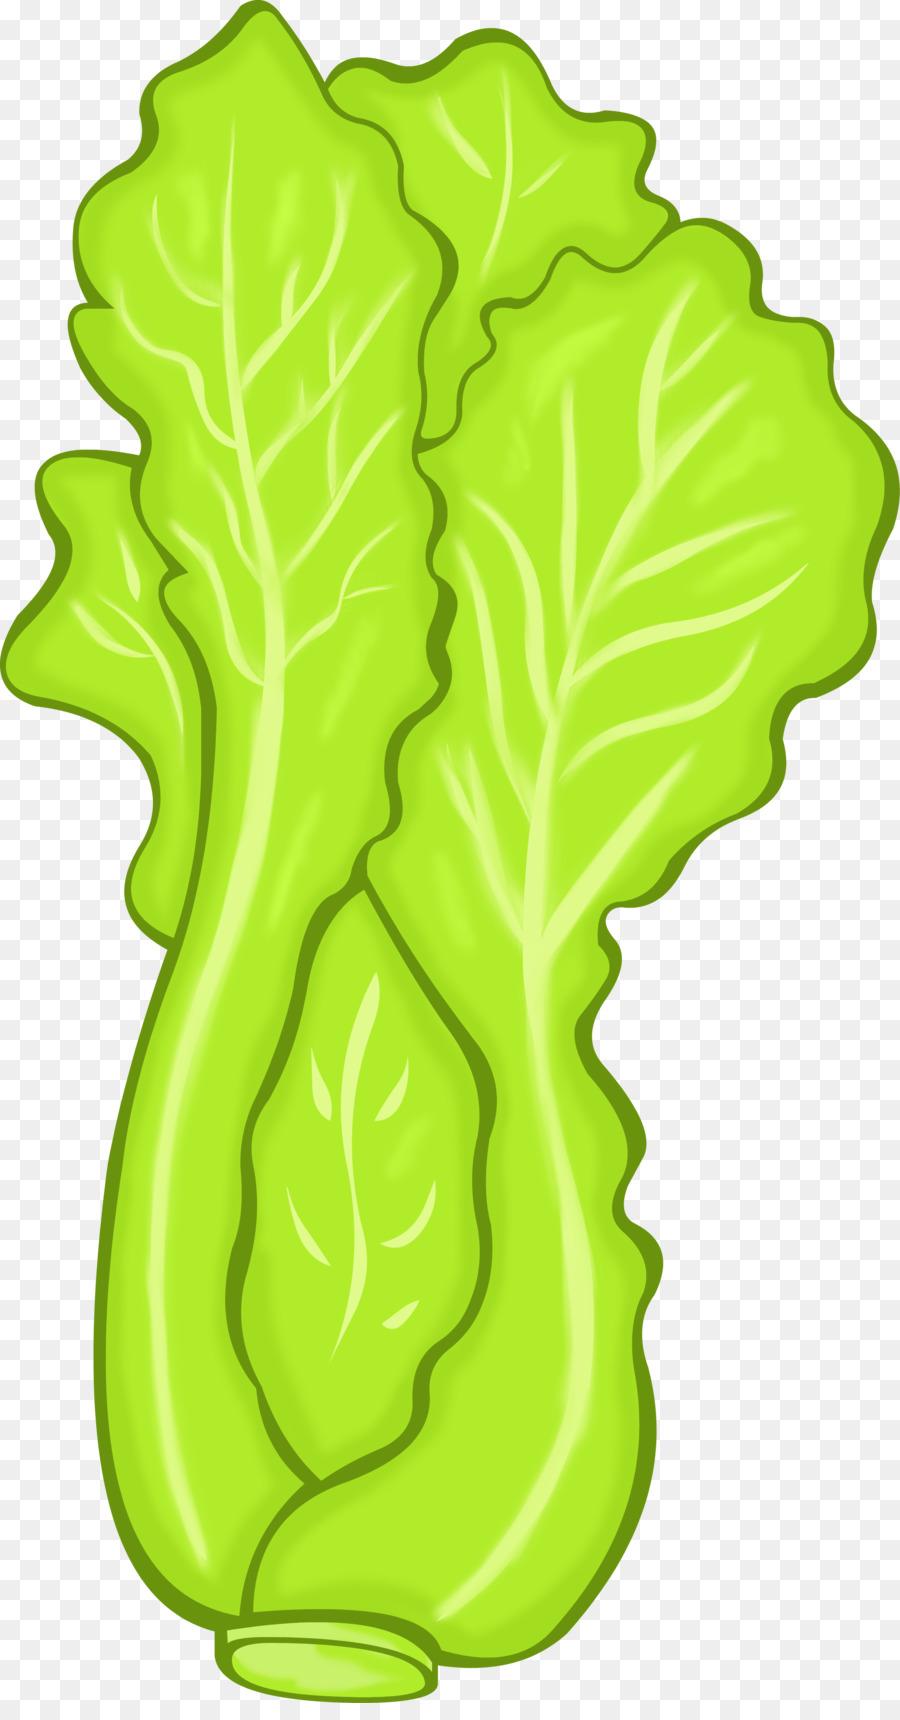 Vegetarian cuisine vegetable food. Broccoli clipart lettuce